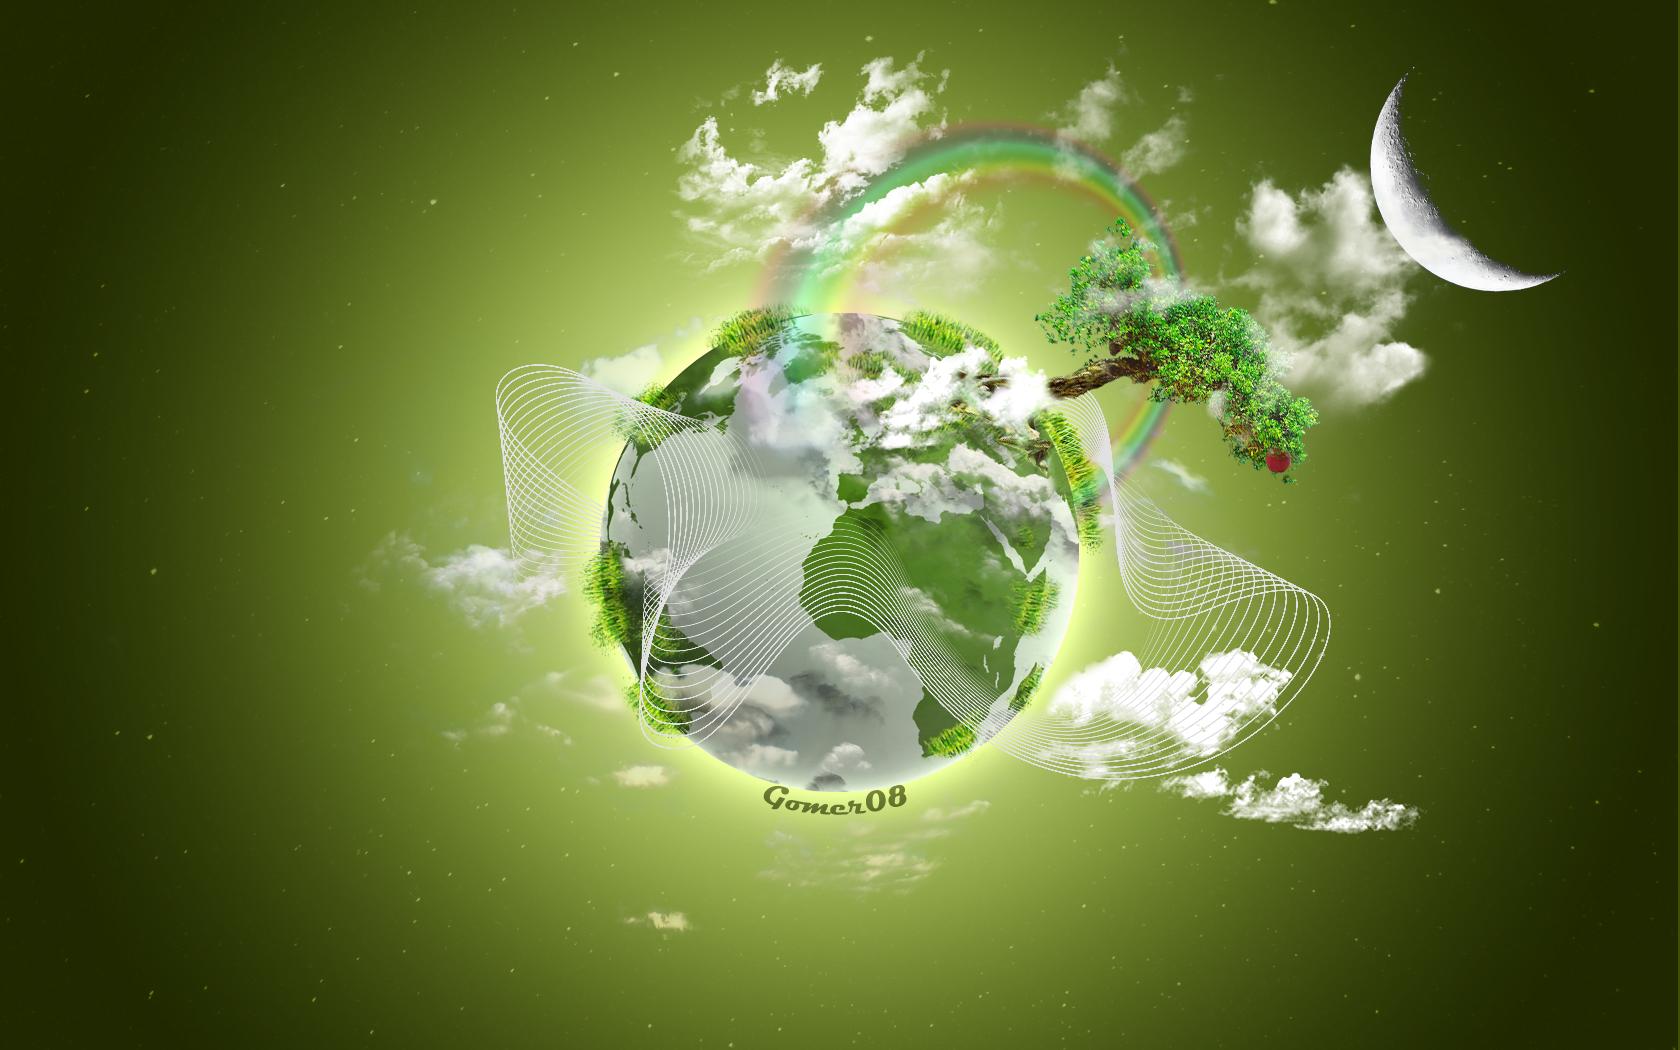 green planetgomer08 on deviantart